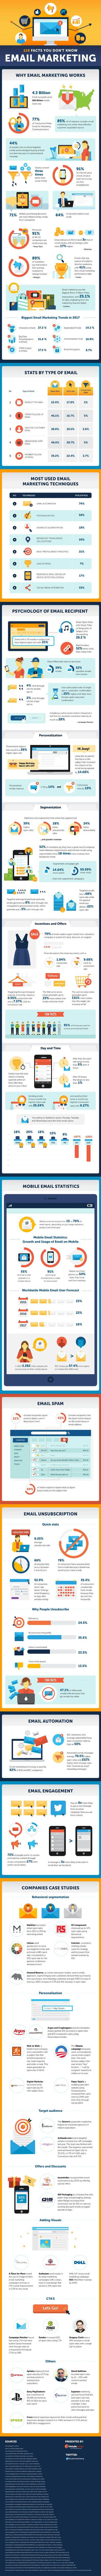 Email marketing infog